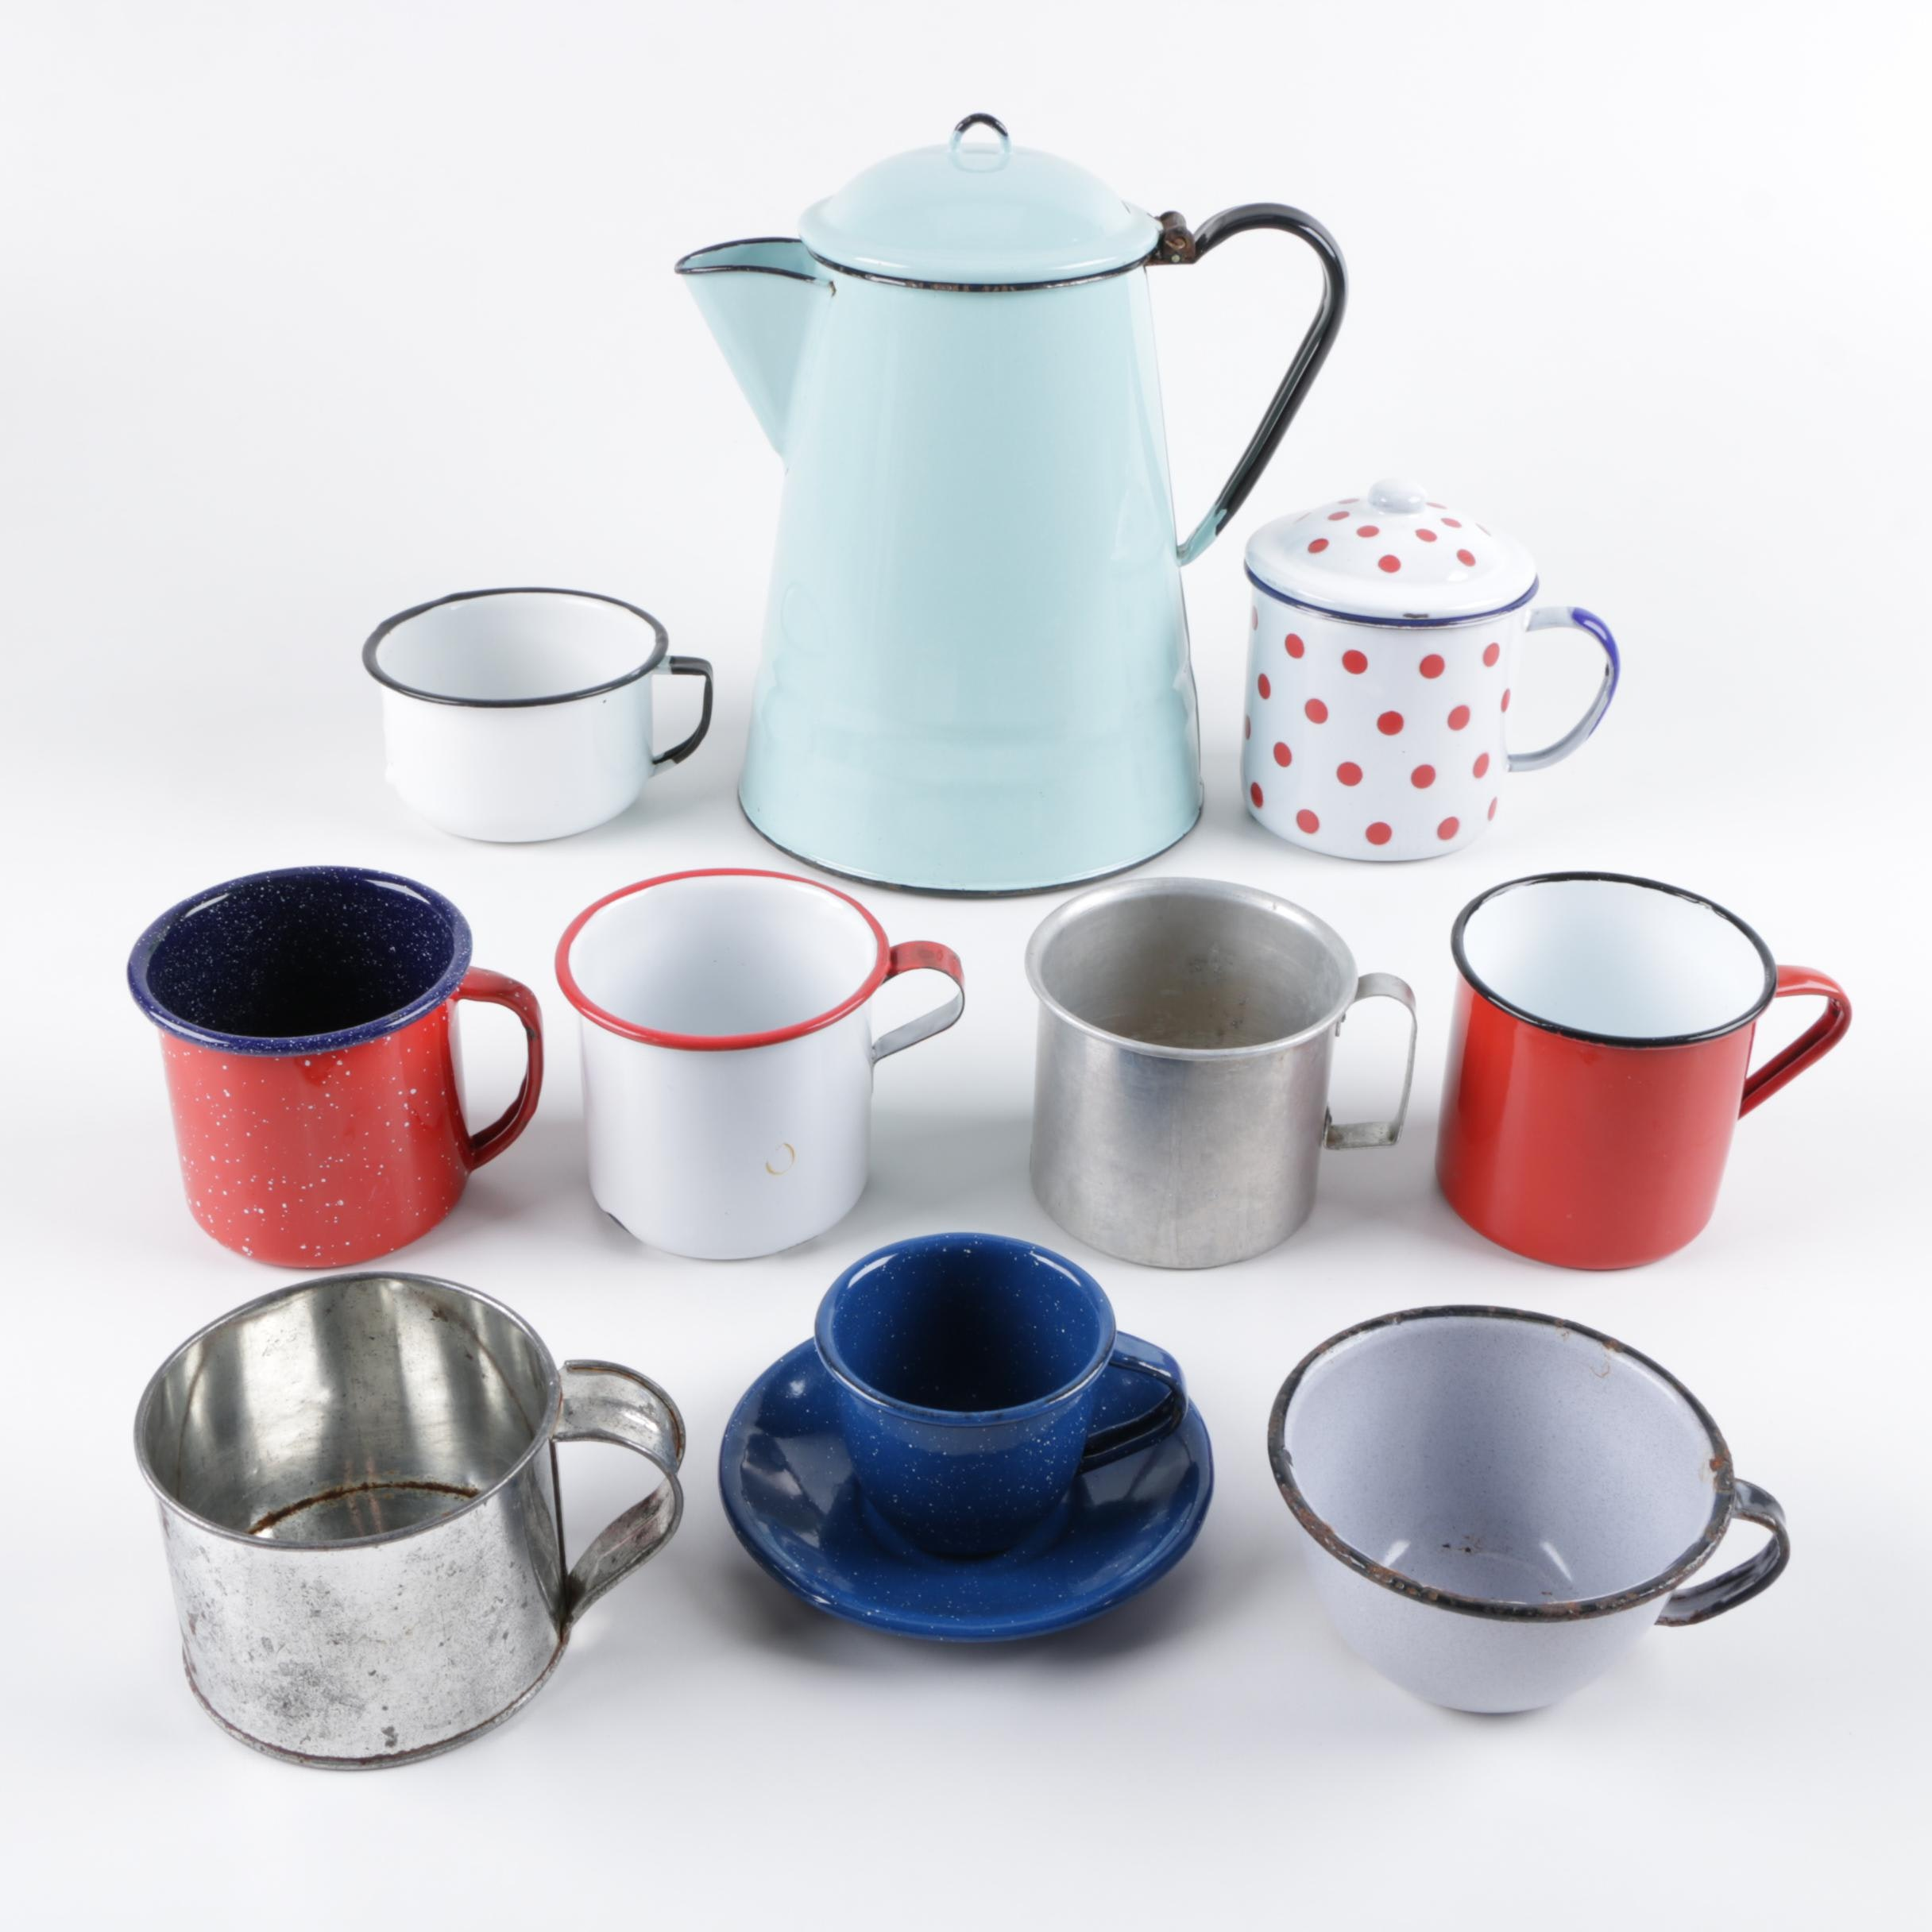 Vintage Enameled Metal Teapot and Mugs